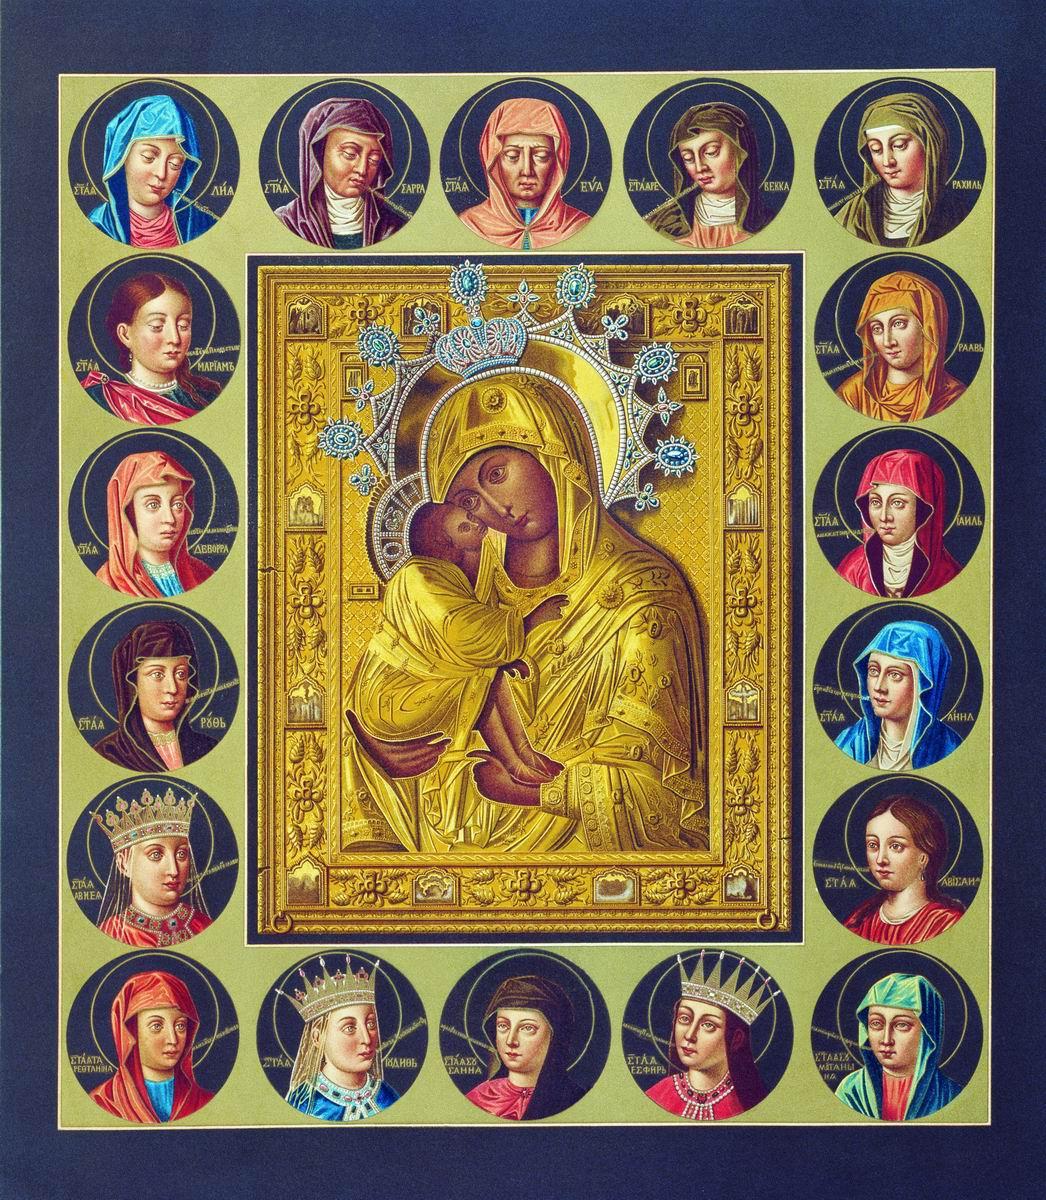 https://commons.wikimedia.org/wiki/File:Drevnosti_RG_v1_ill018a_-_Eleusa_with_Old_Testament_women.jpg